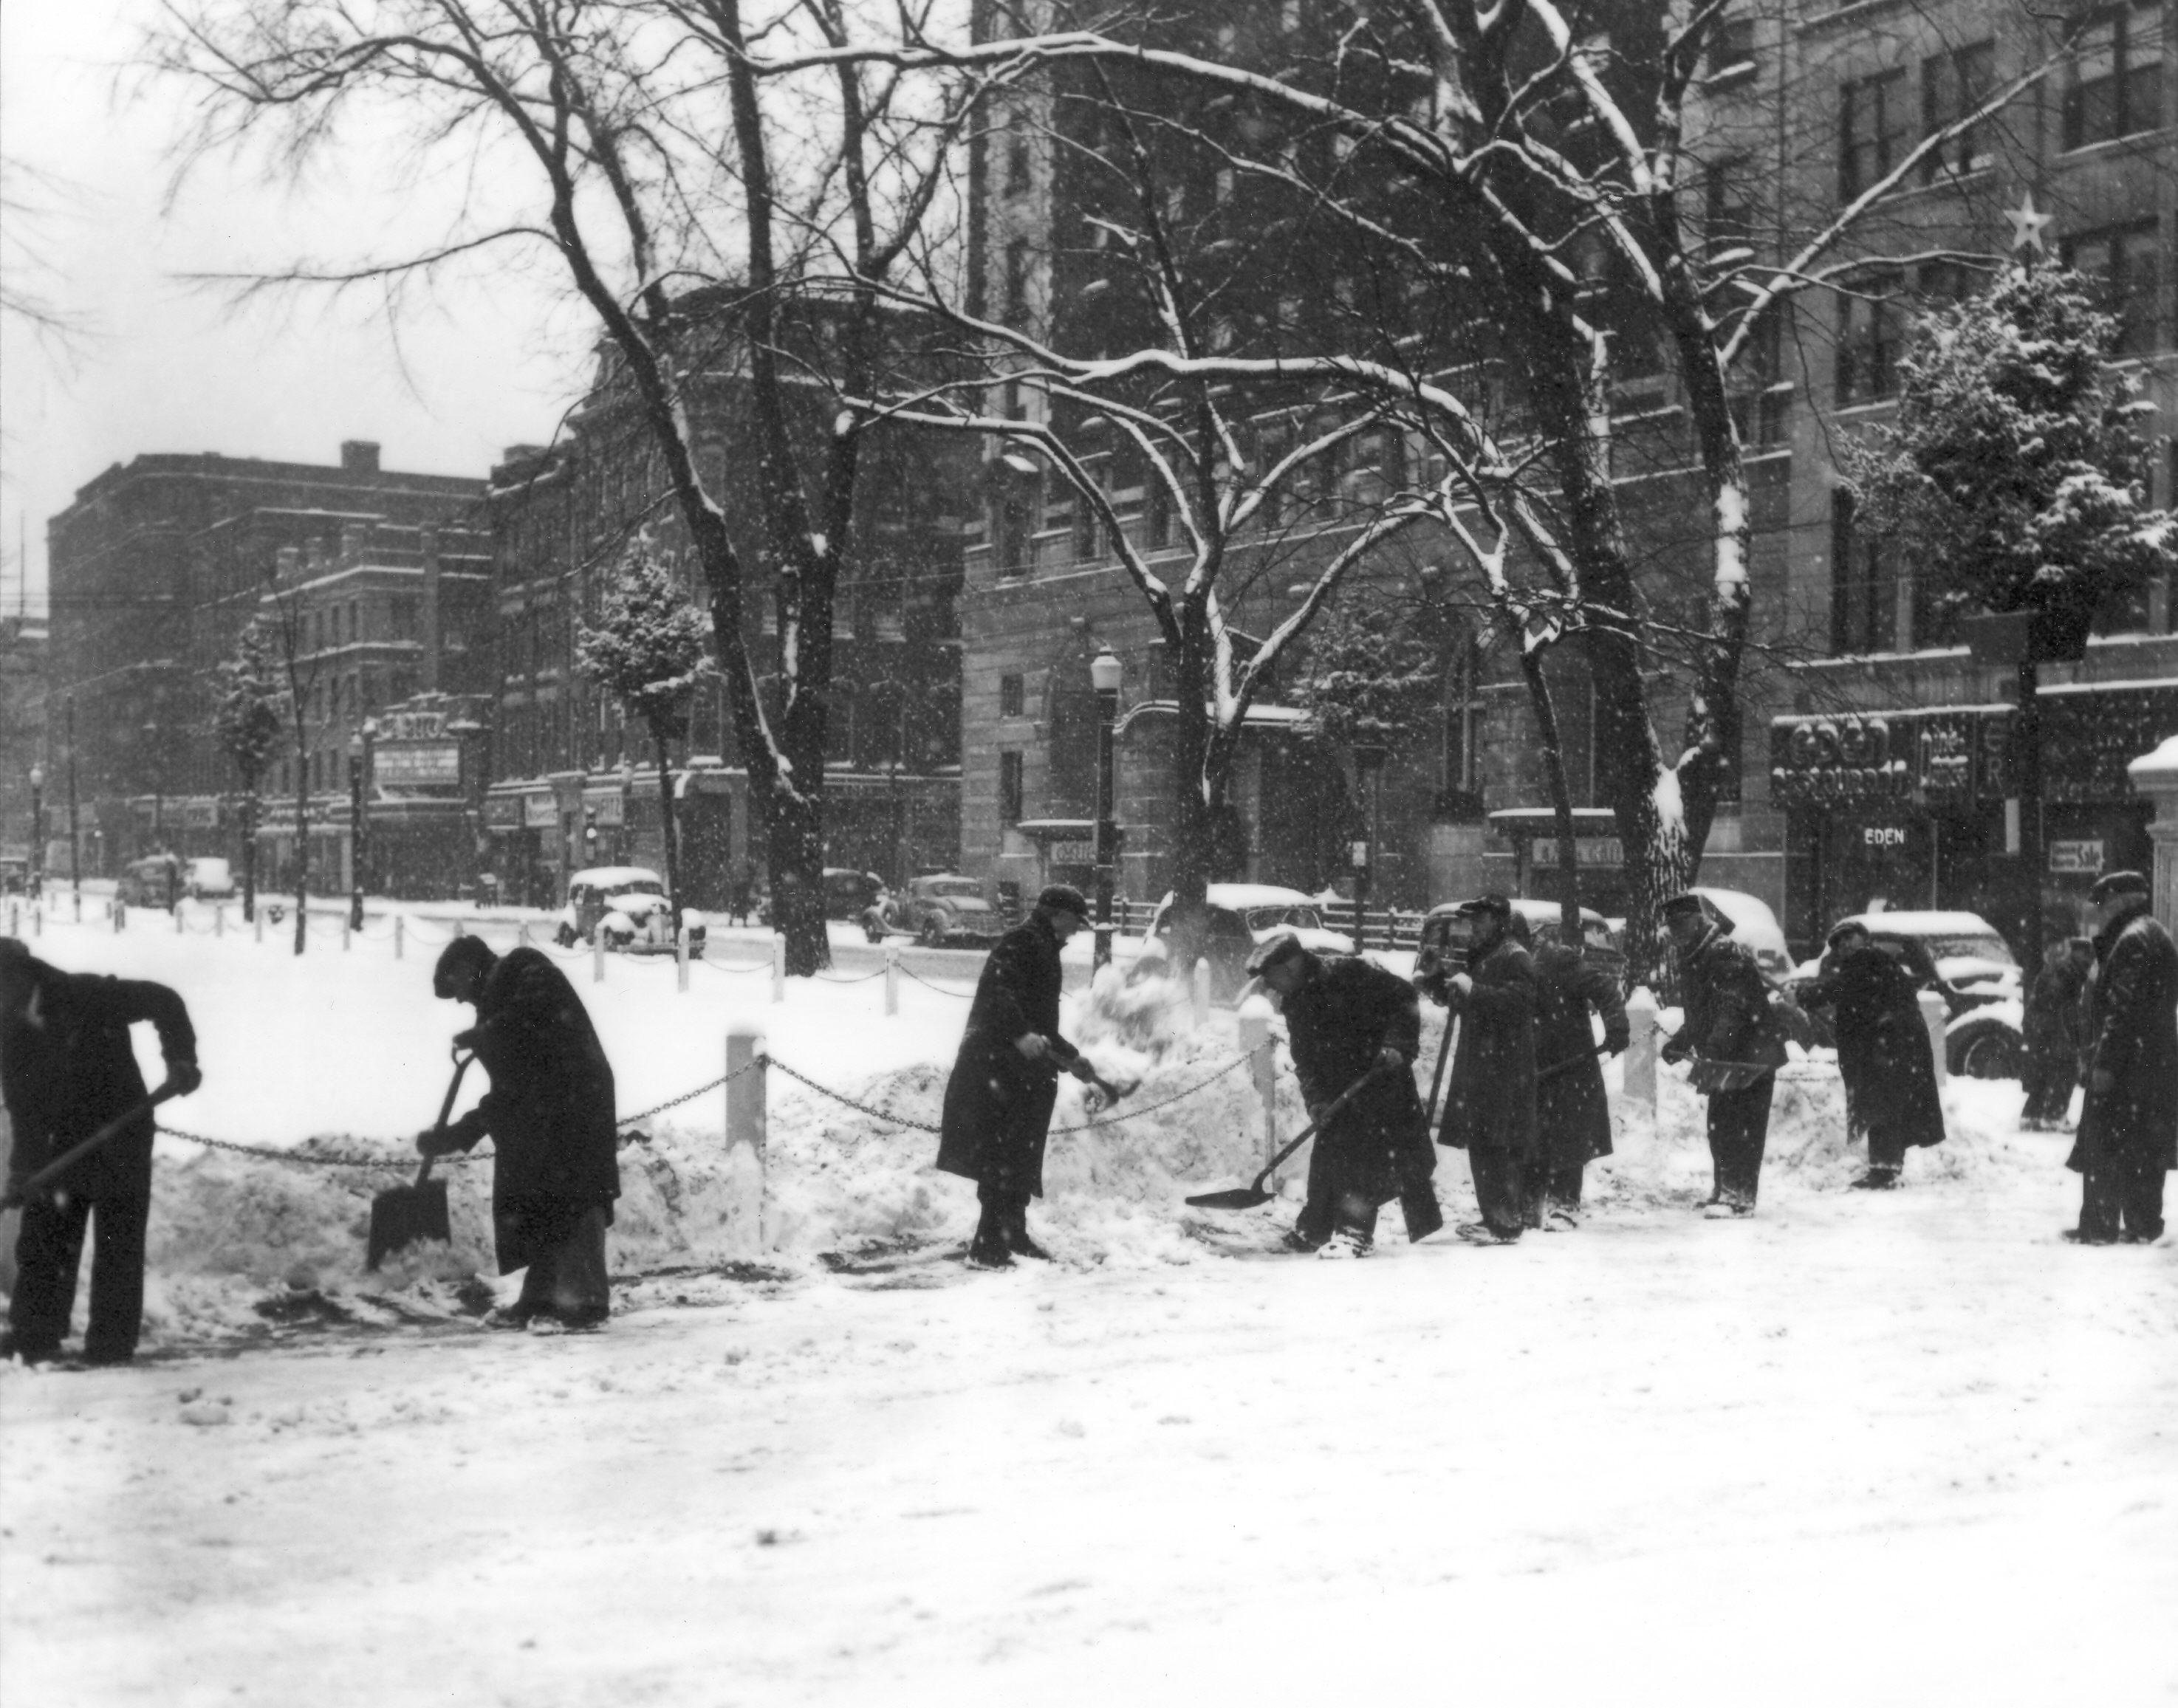 Shoveling snow near Worcester Common (1939)